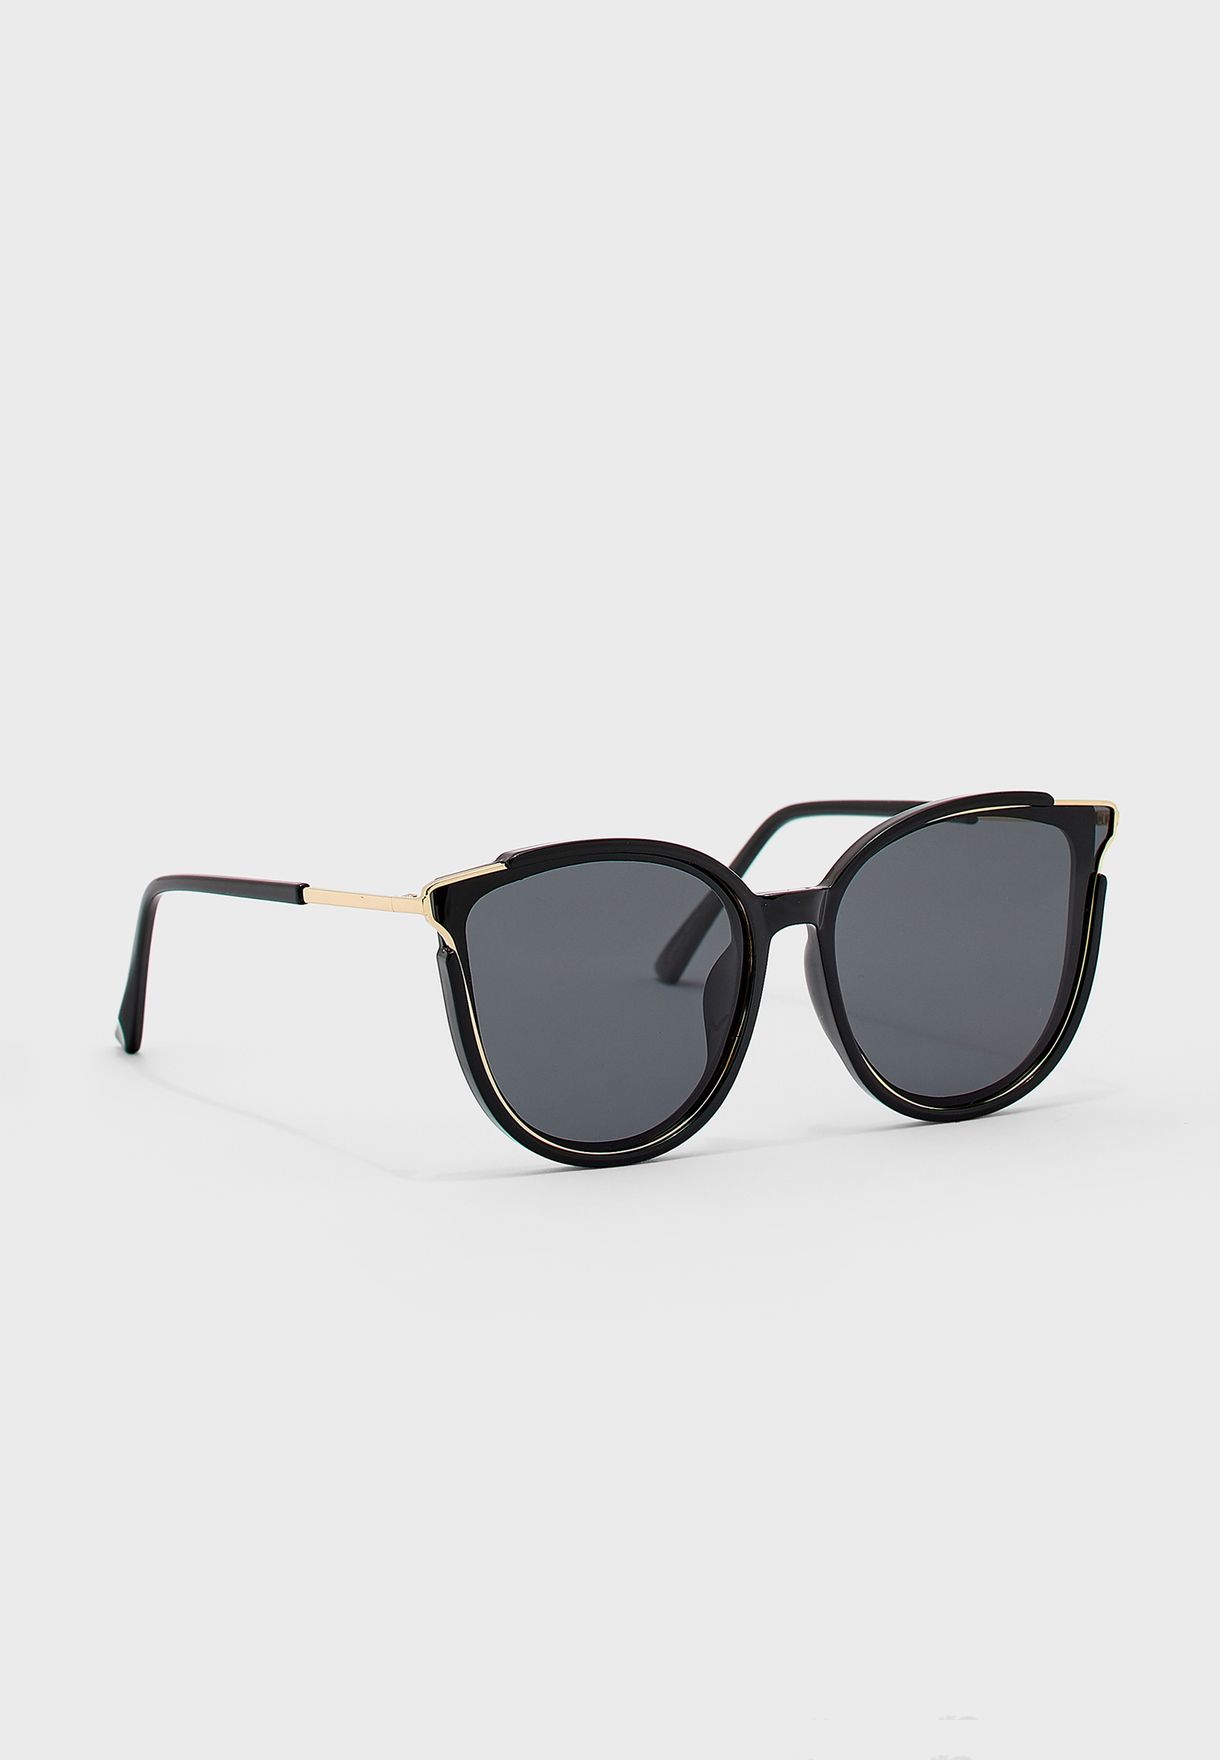 Polarized Cateyes Sunglasses With Gold Trim